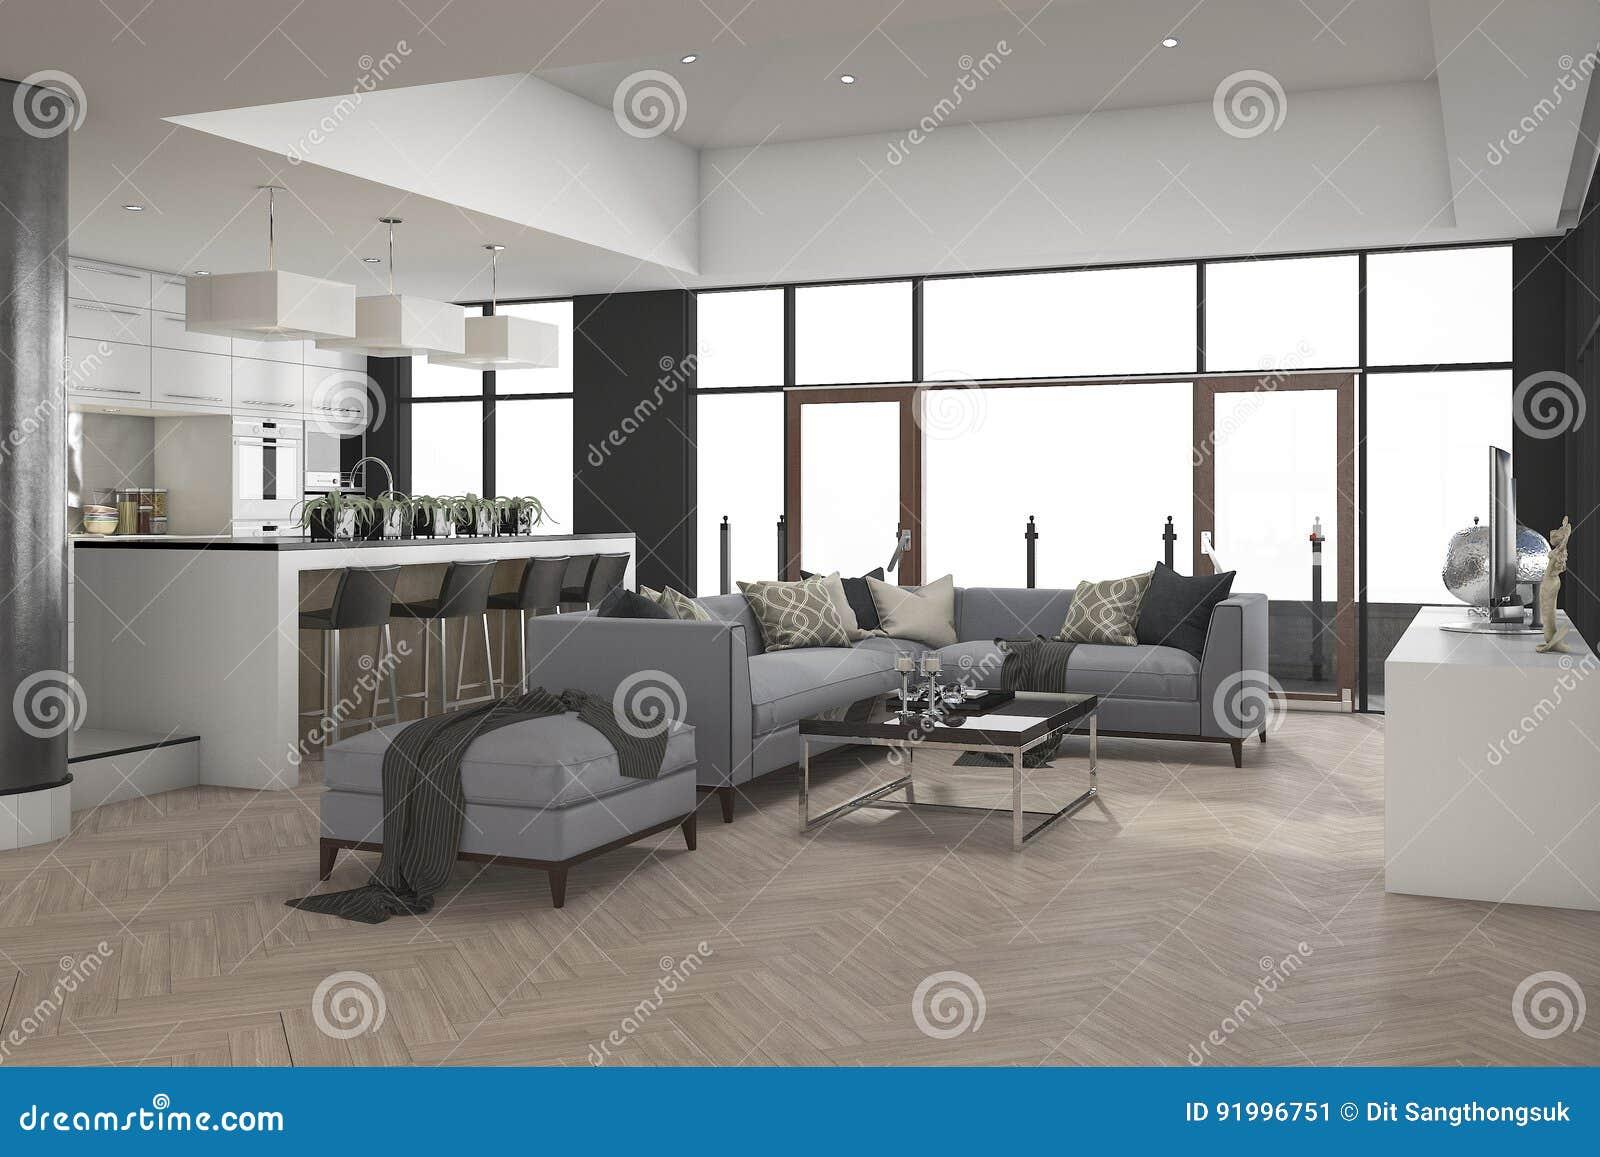 100 Kitchen To Living Room Window Style Impressive